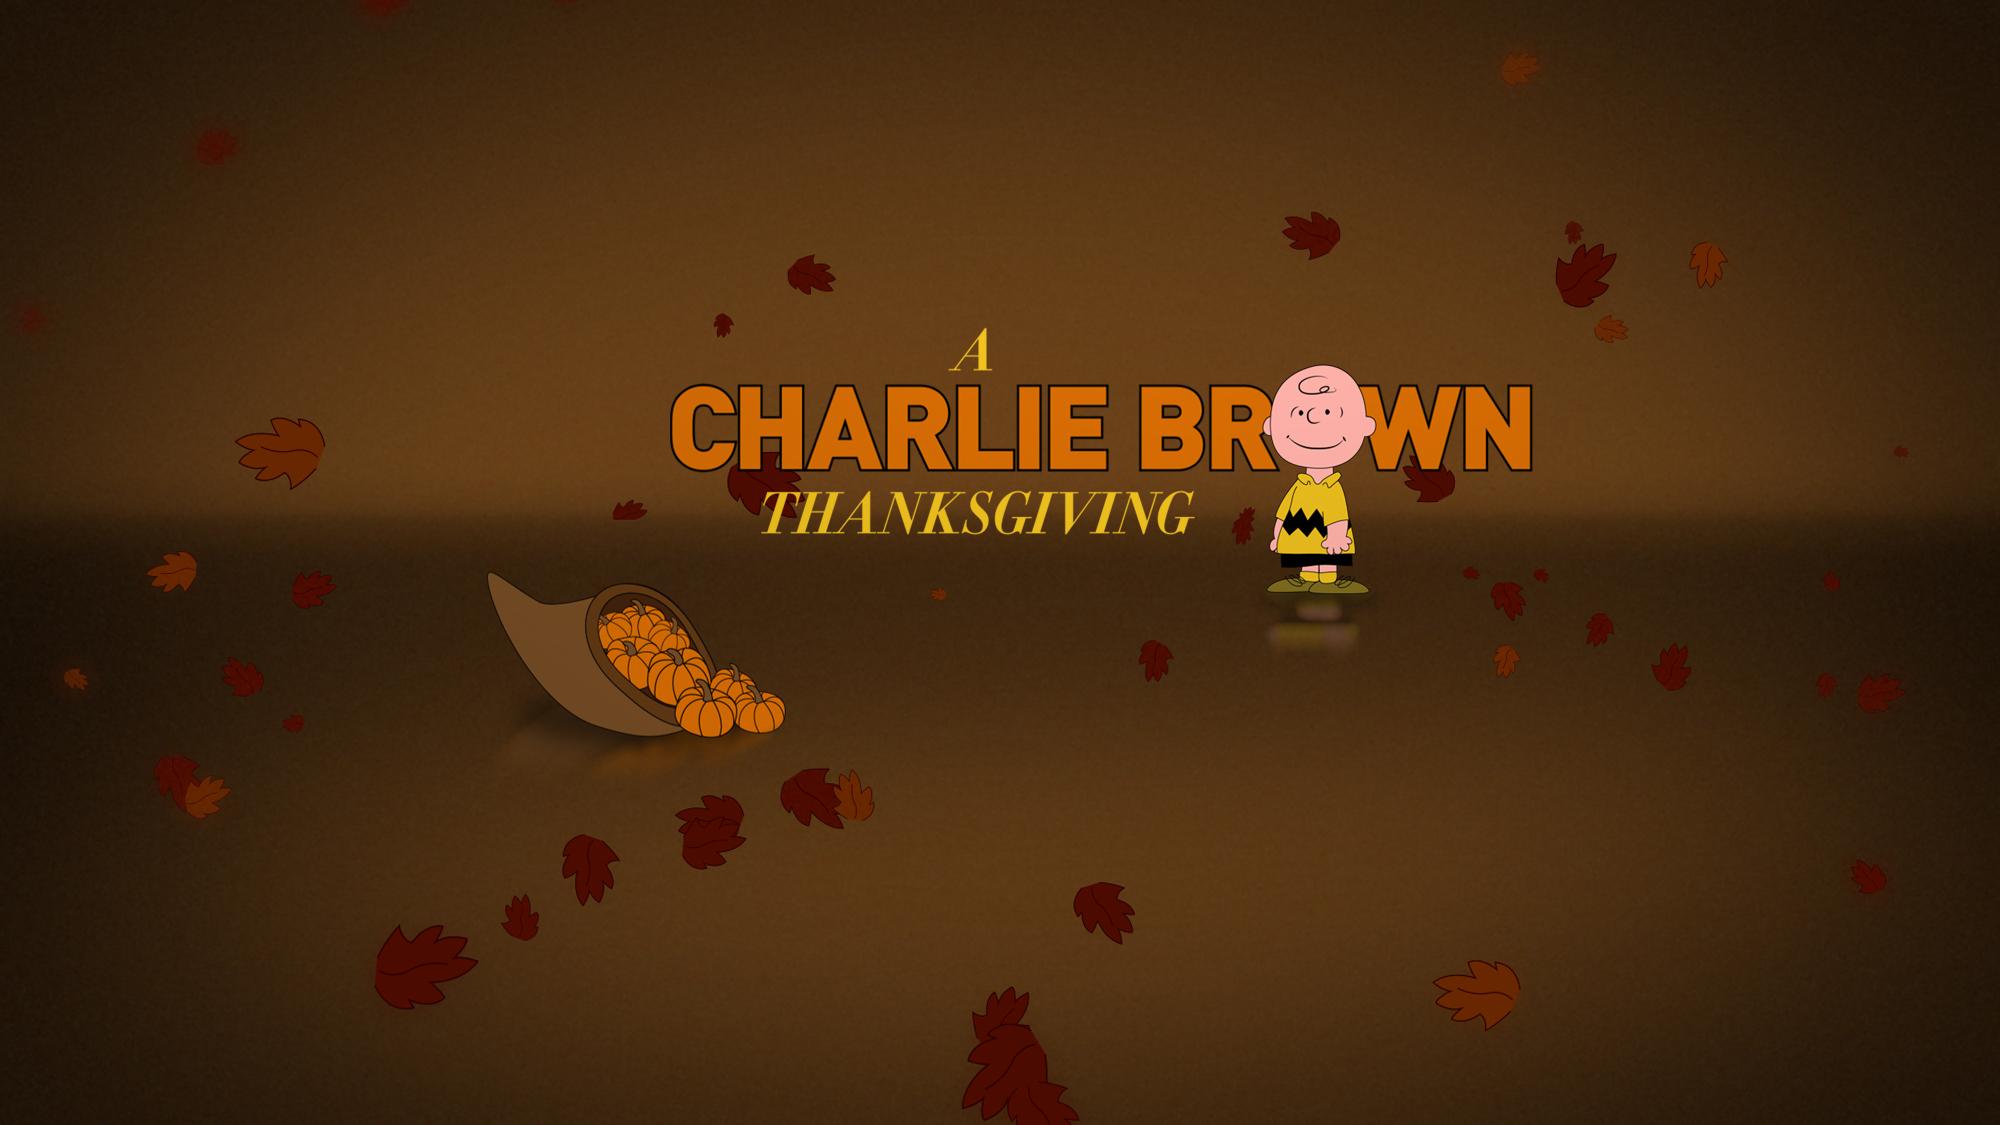 charlie brown thanksgiving cast roger blackraven actor